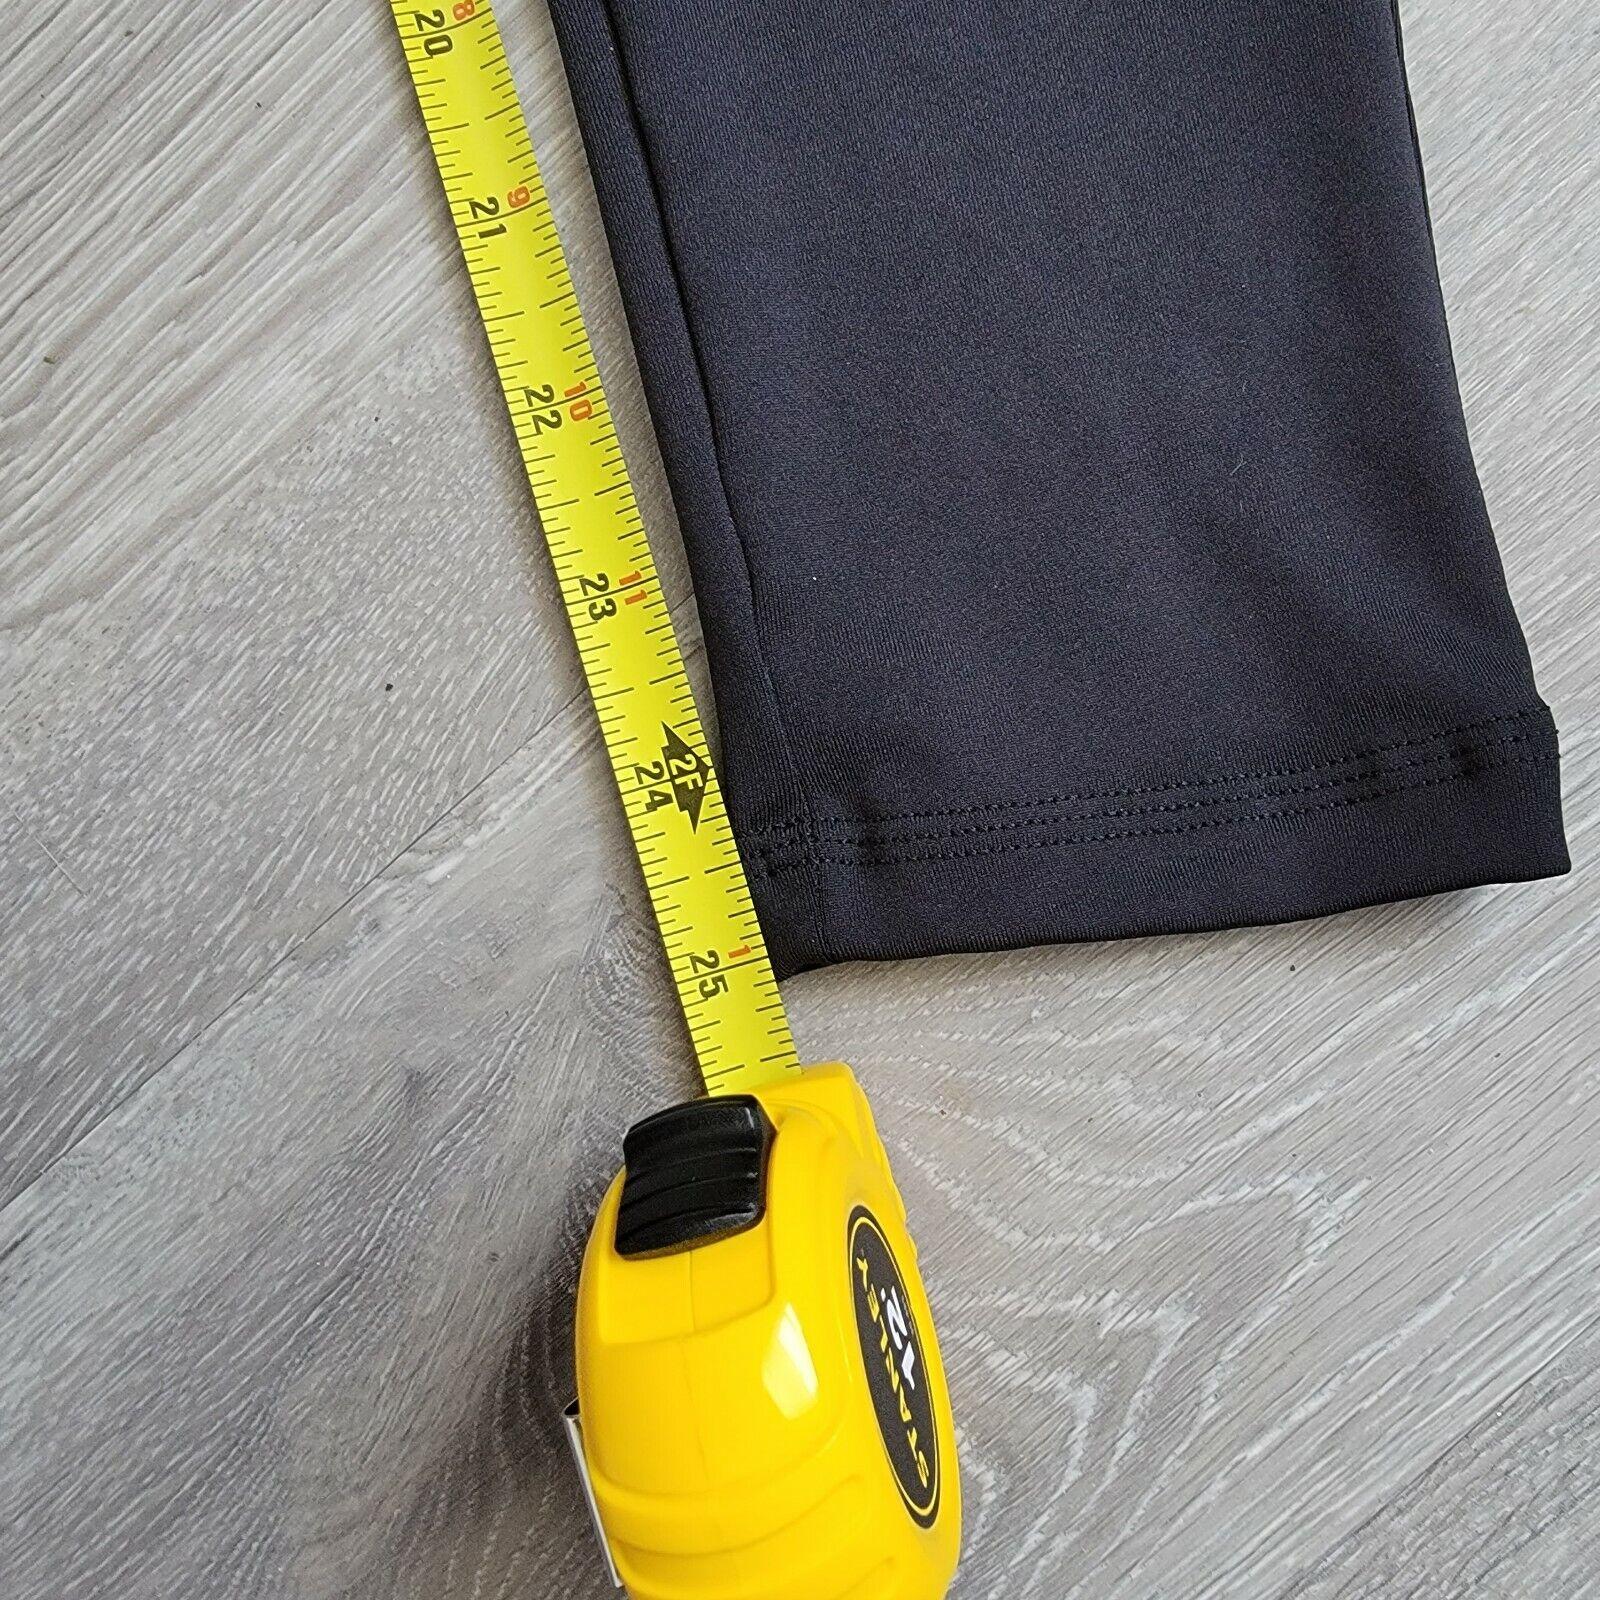 Olympia Activewear AJAX Full Lenght Black Jet Leg… - image 11